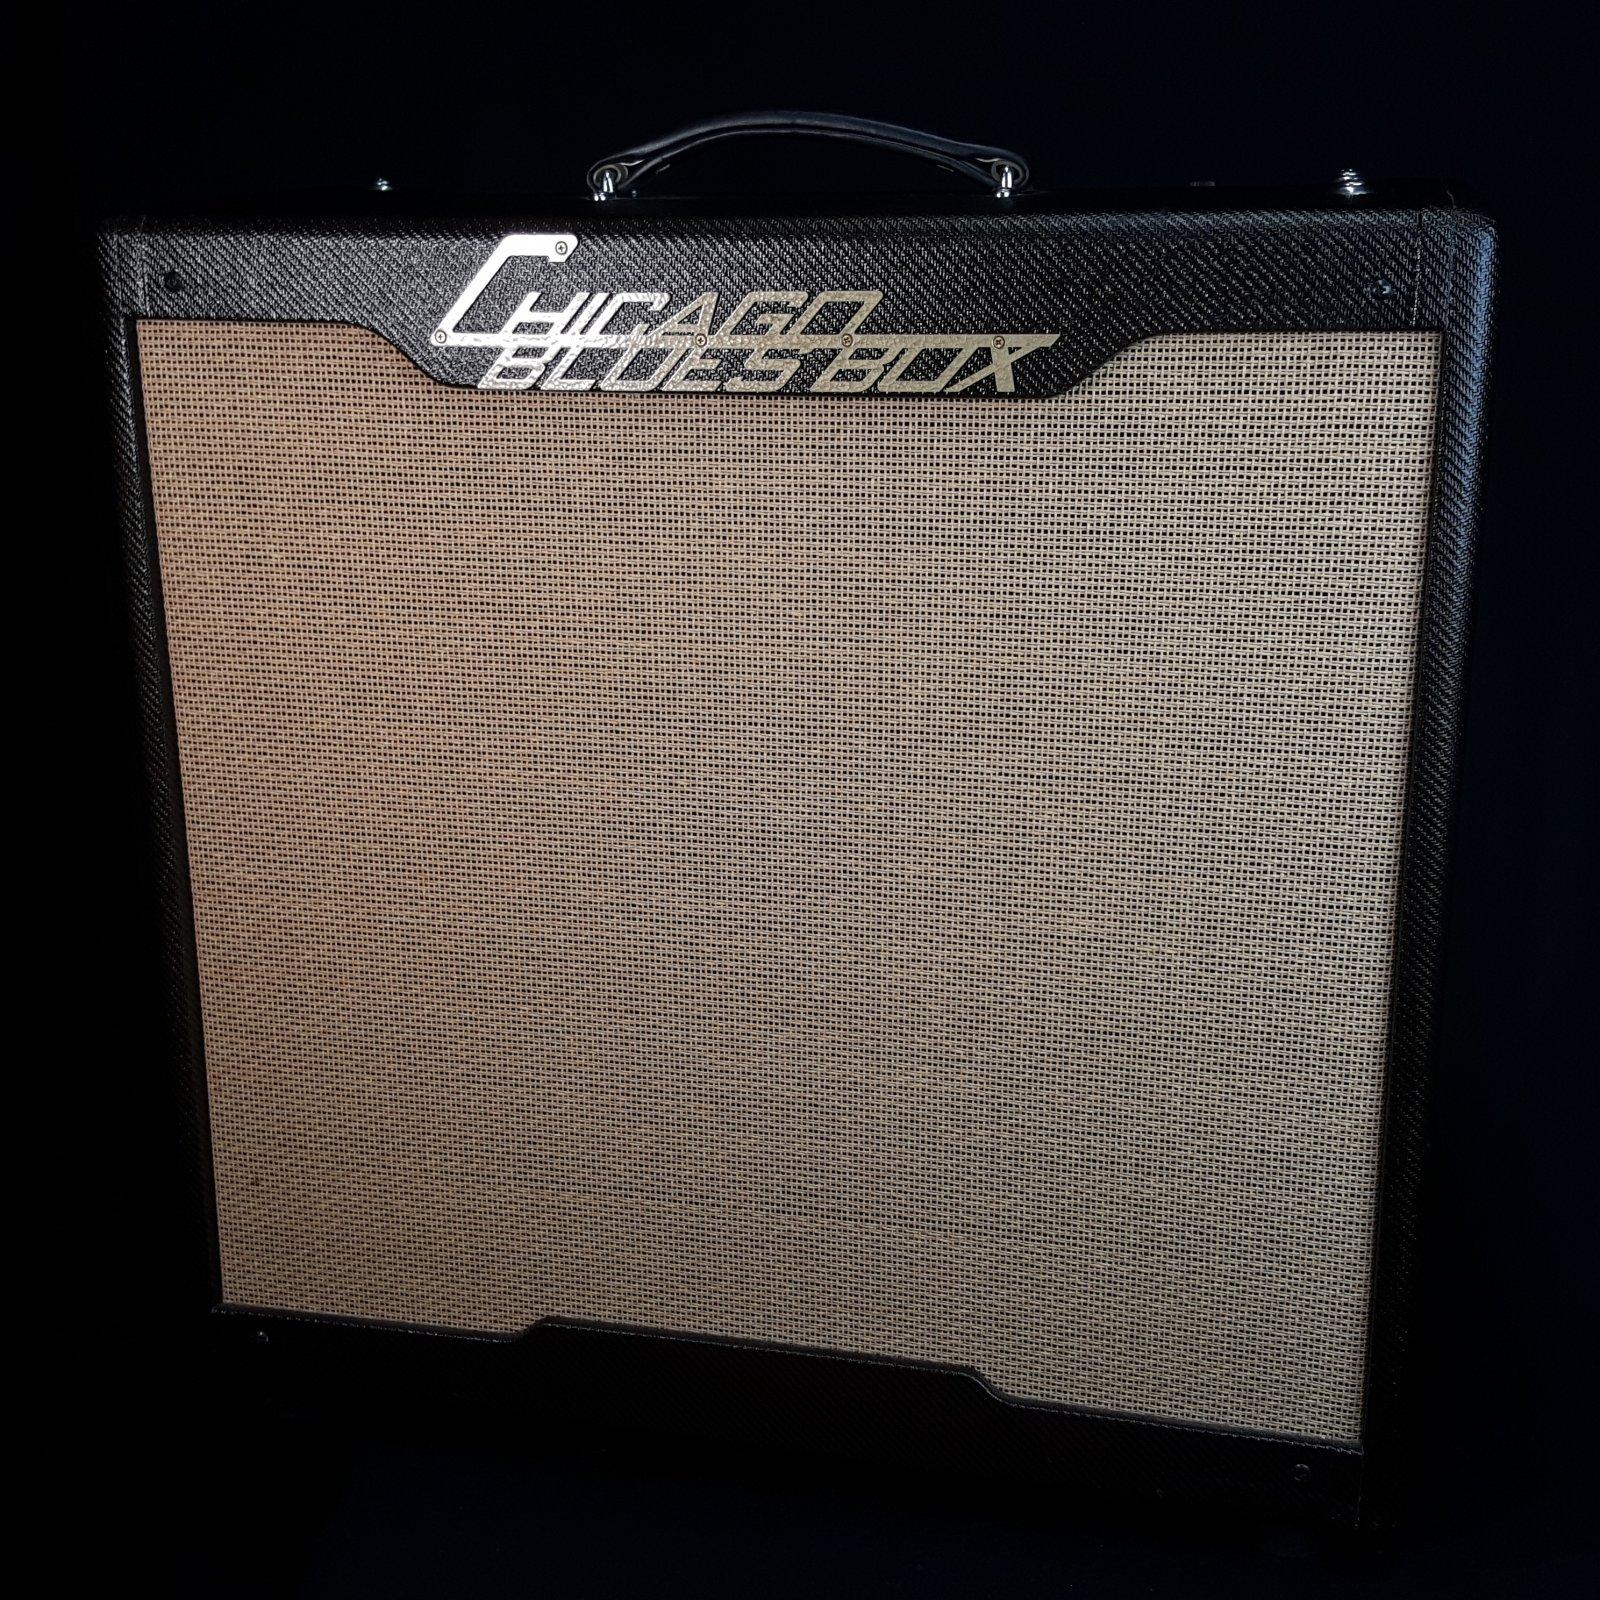 Chicago Blues Box Butler Custom Buddy Guy 4x10 Tube guitar combo amplifier w/ Cover